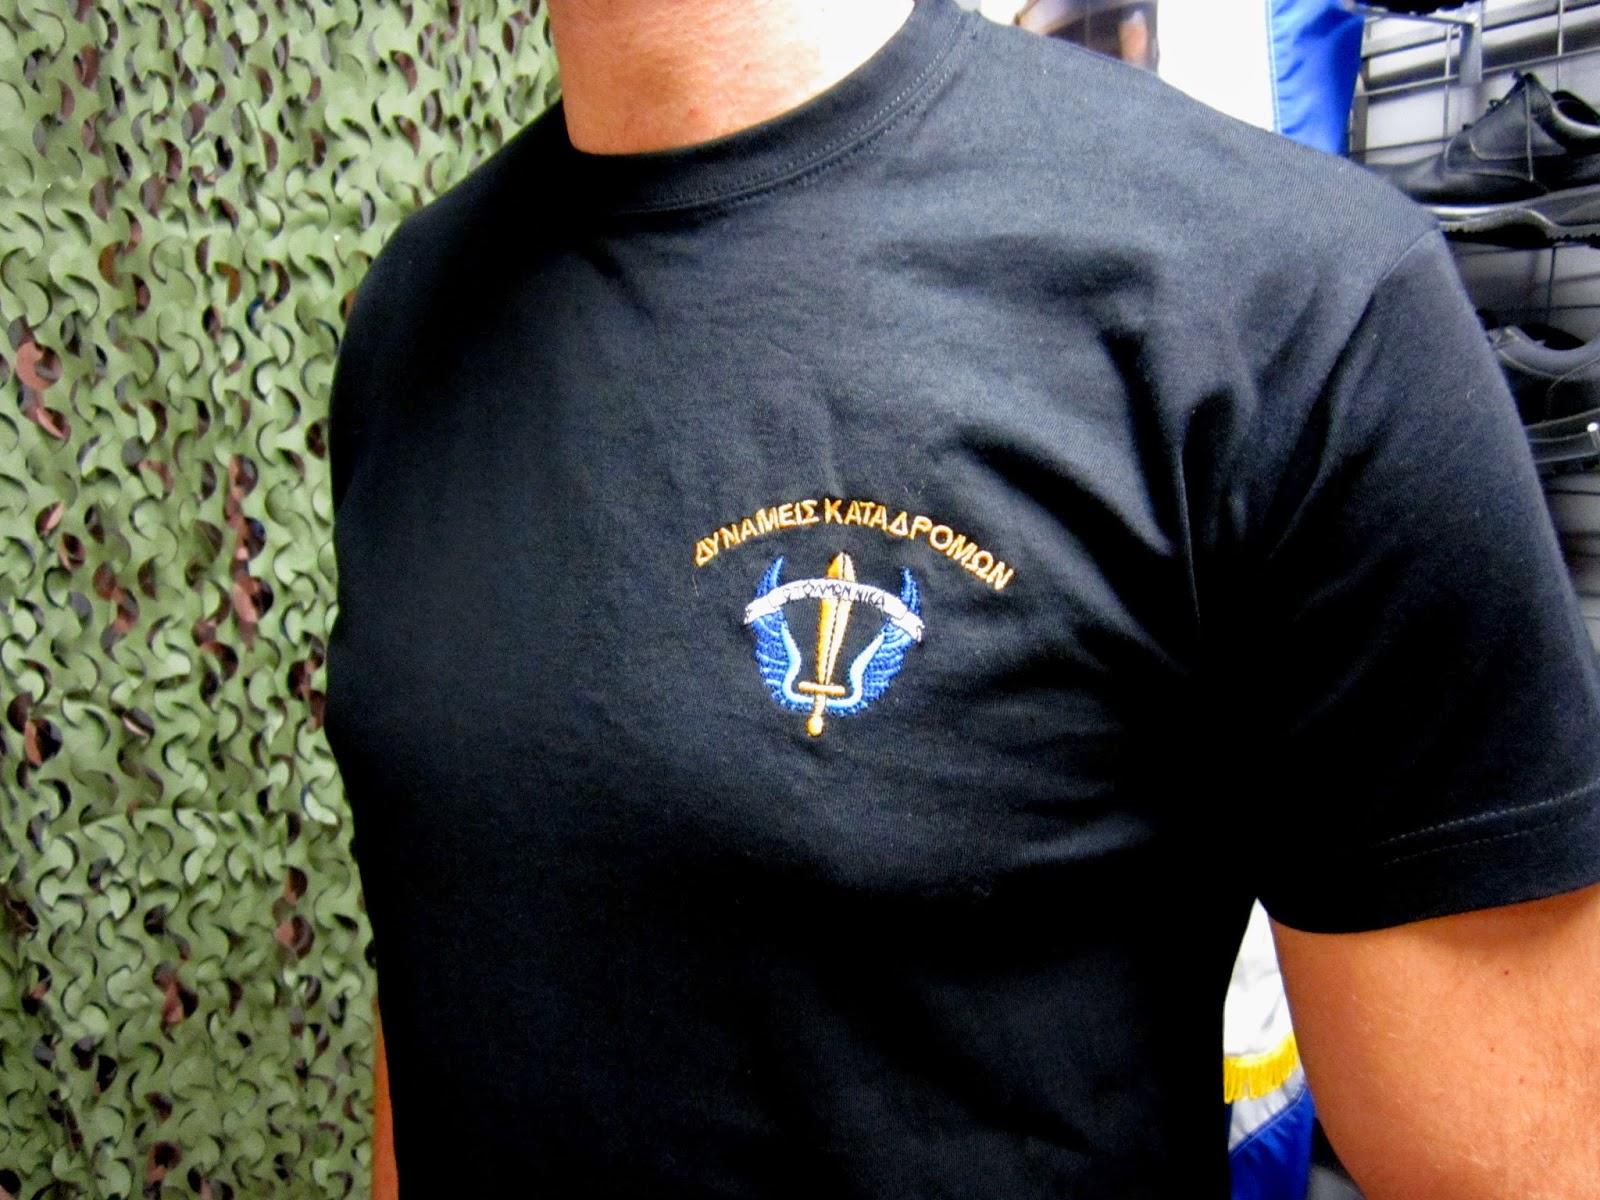 mpimpos army shop   Β  ΜΟΙΡΑ ΚΑΤΑΔΡΟΜΩΝ   ΔΥΝΑΜΕΙΣ ΚΑΤΑΔΡΟΜΩΝ d79d566c50d